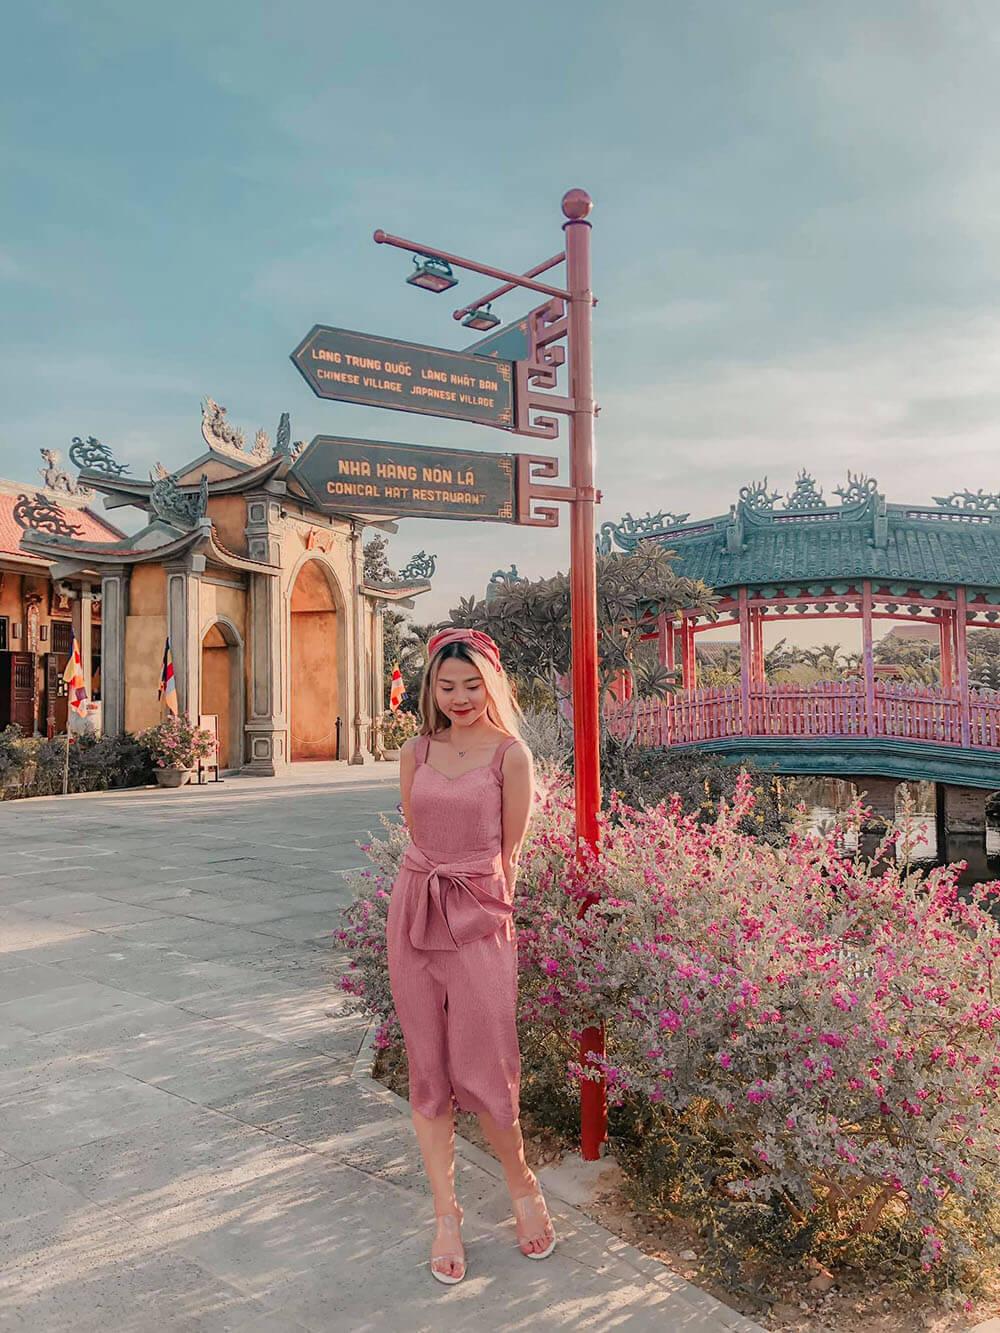 Cong Vien An Tuong Hoi An Show Dien Ky Uc Hoi An Review Kinh Nghiem Kham Pha Hoi An Chi Trong 1 Ngay Danang Fantasticity Com 06